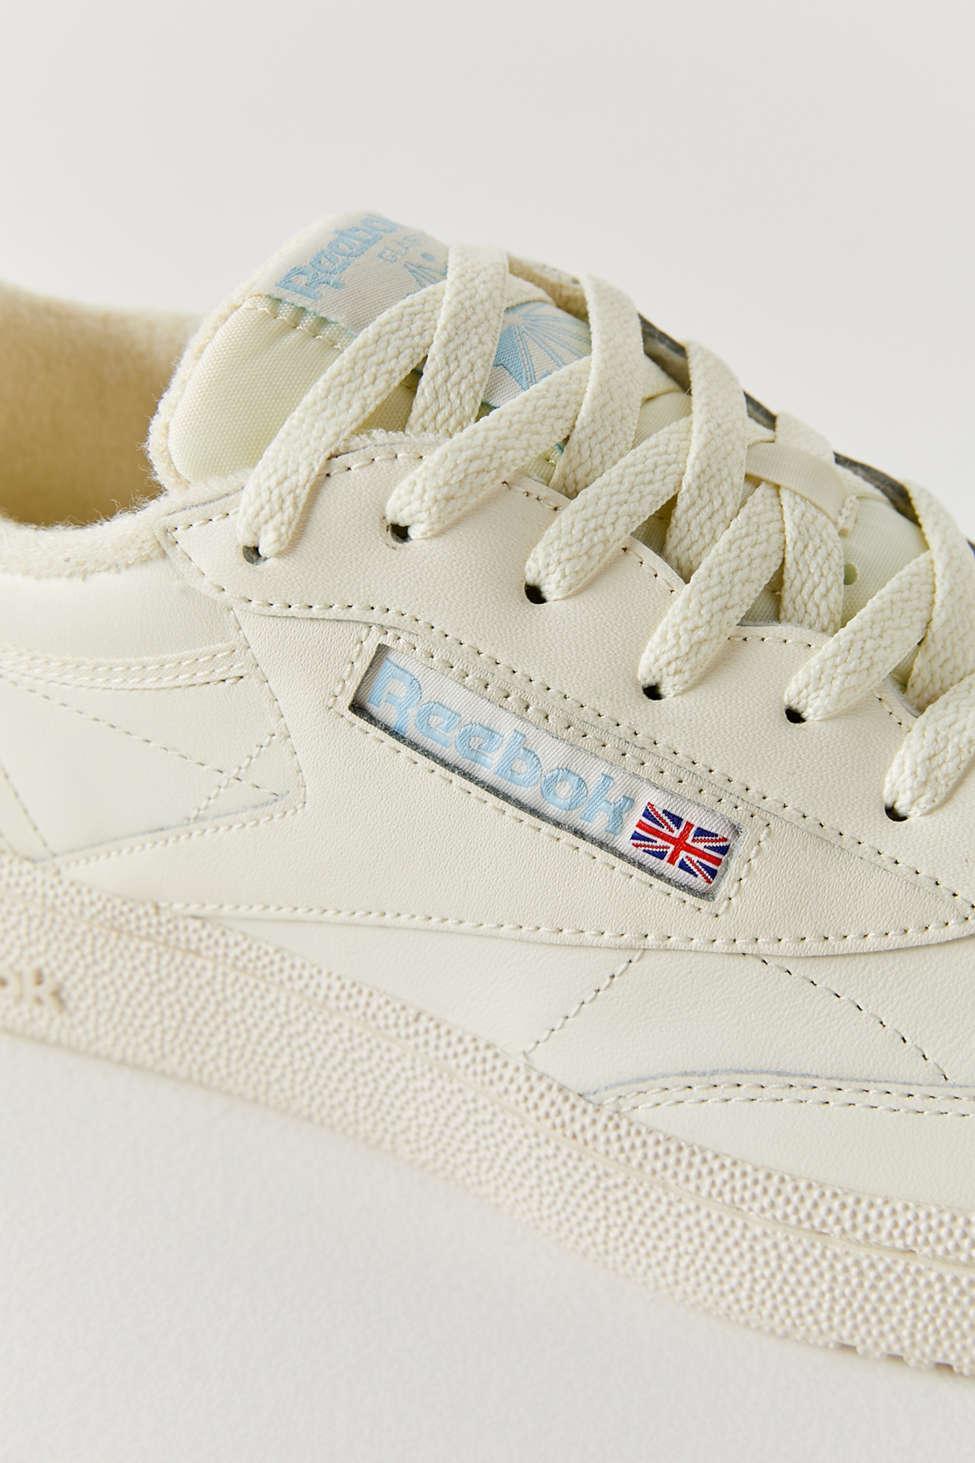 Uo Exclusive Club C 85 Vintage Sneaker